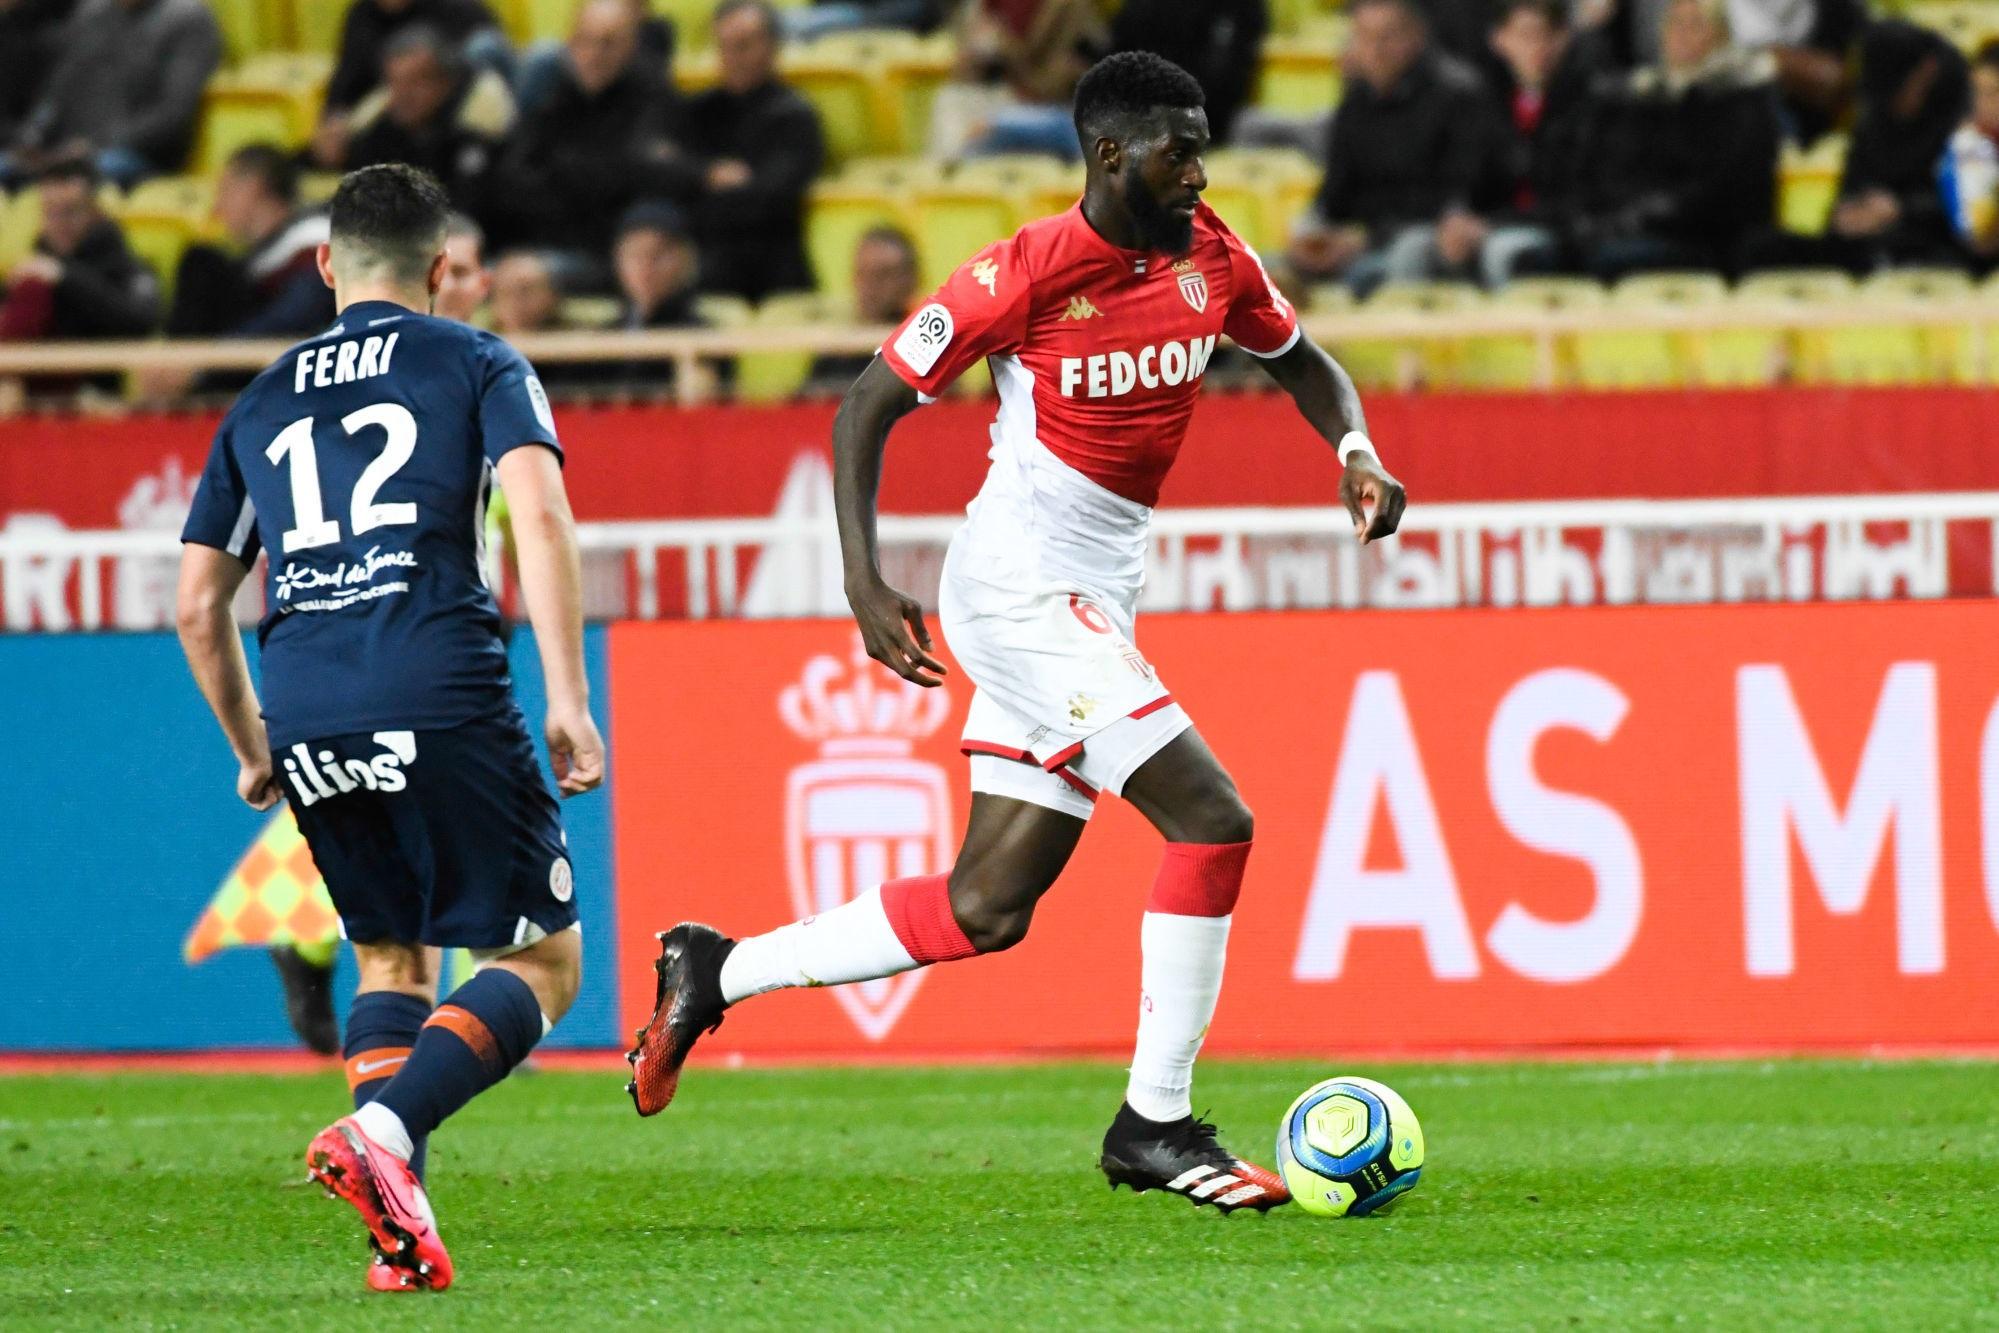 Mercato - Bakayo se rapproche du PSG, confirme Foot Mercato